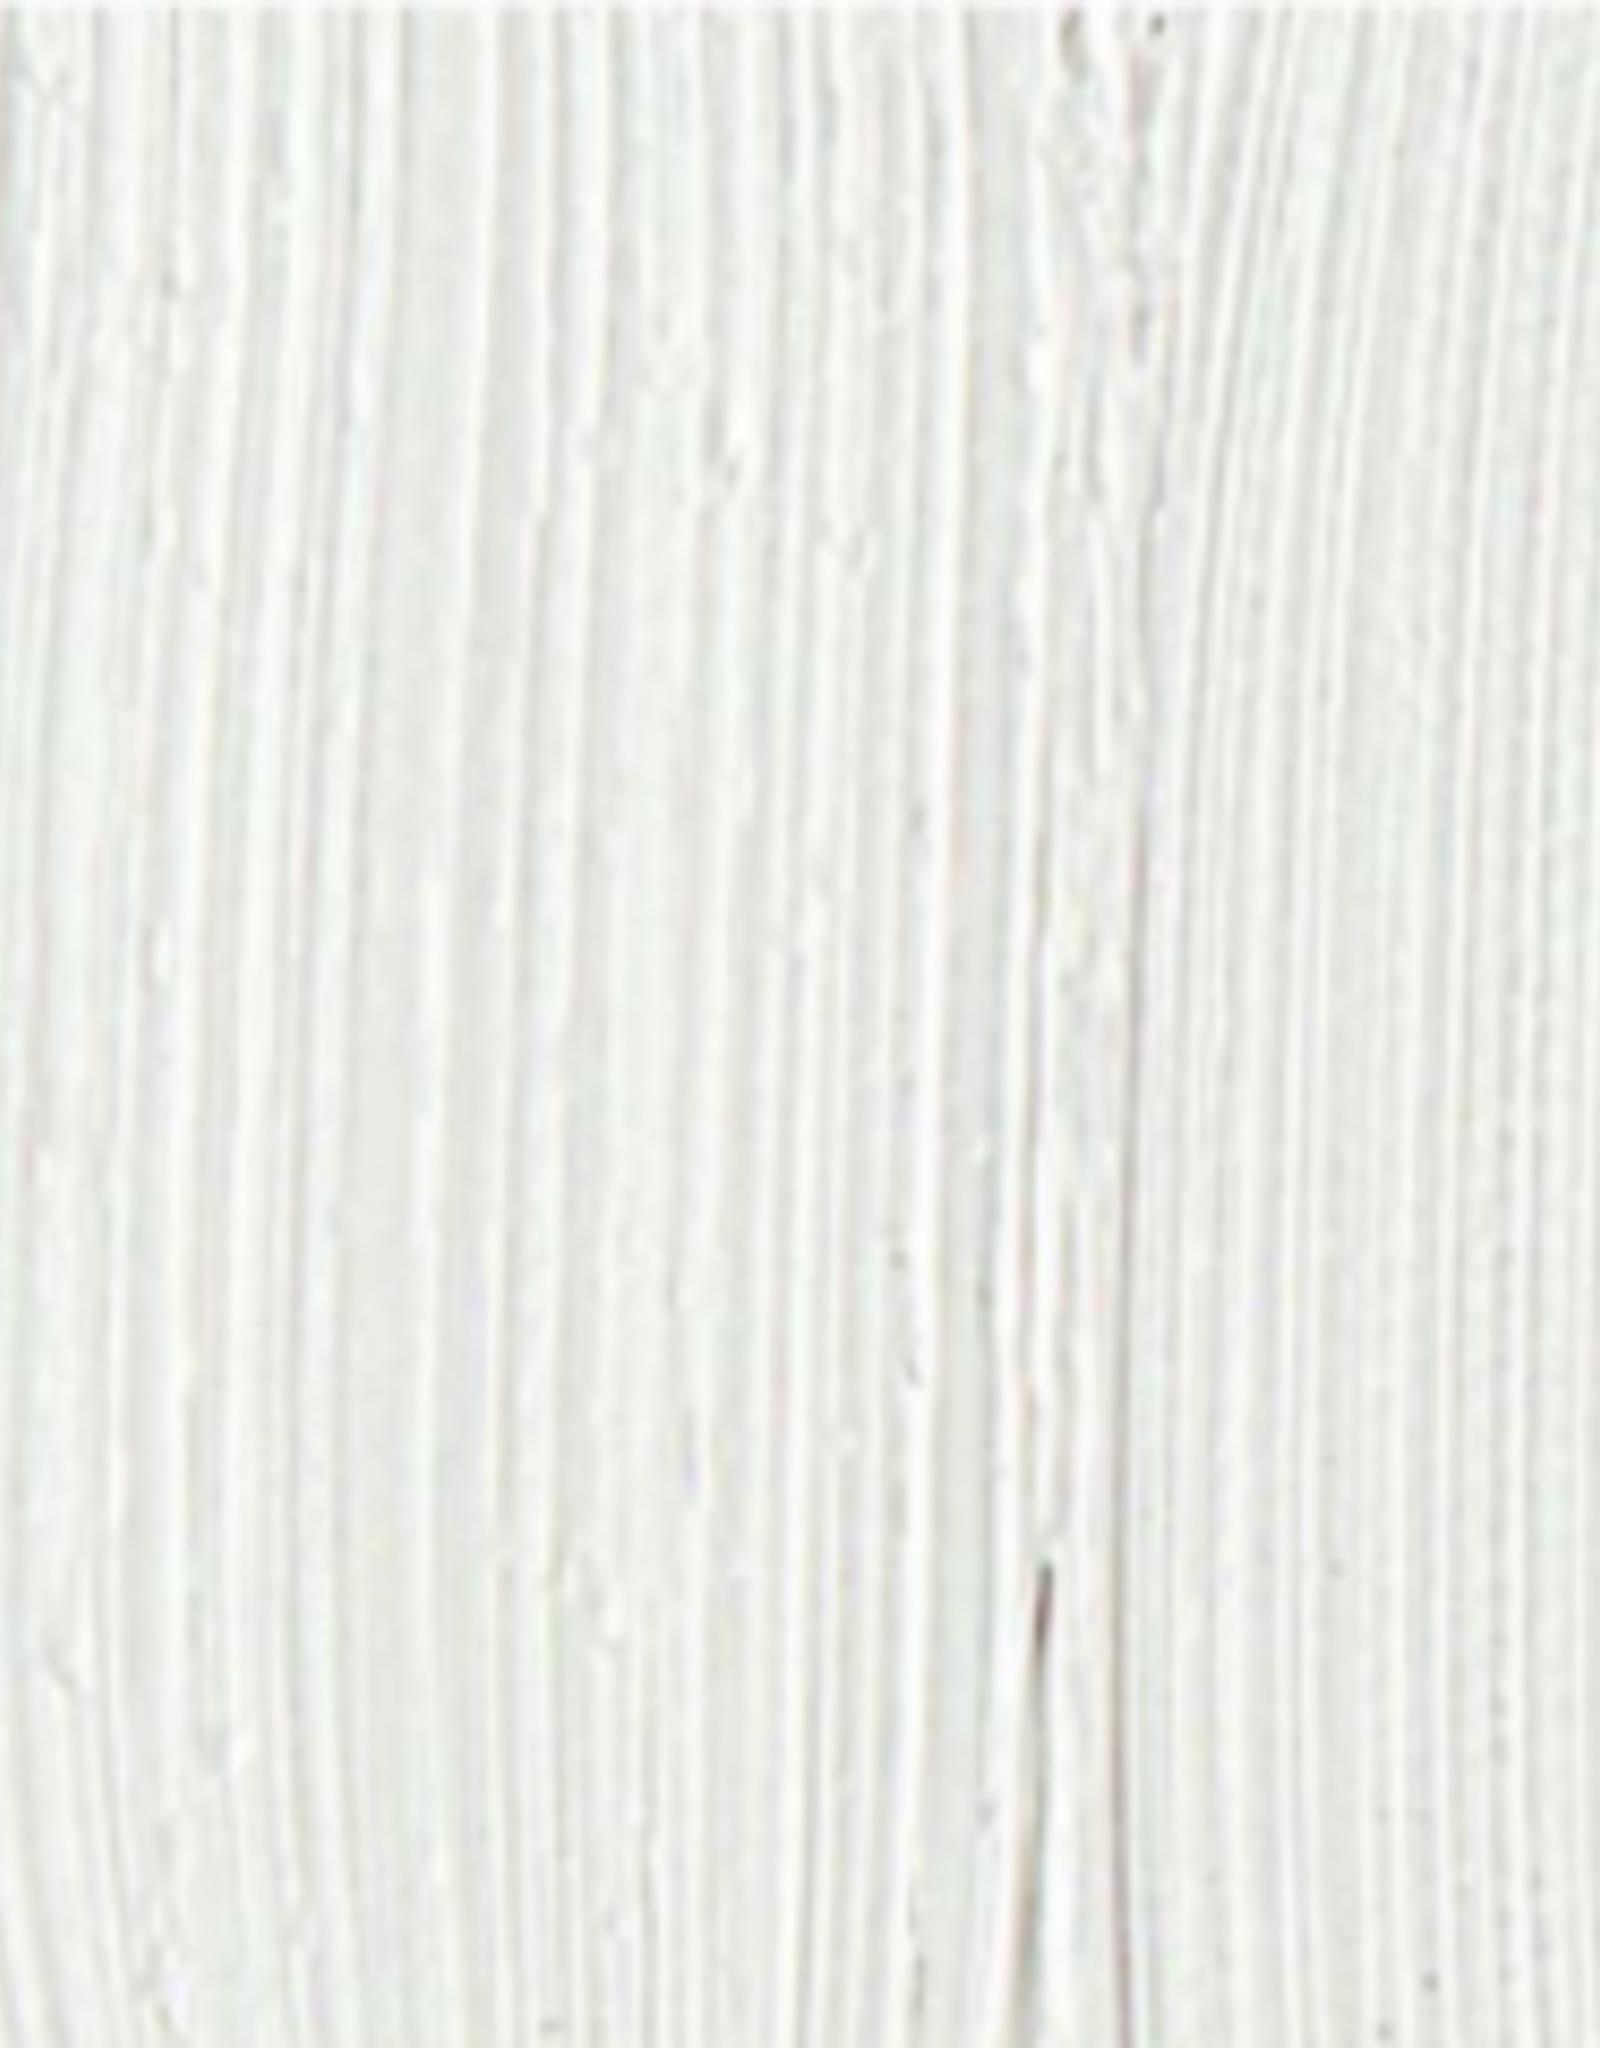 Holbein Oil Color Series W Titanium White